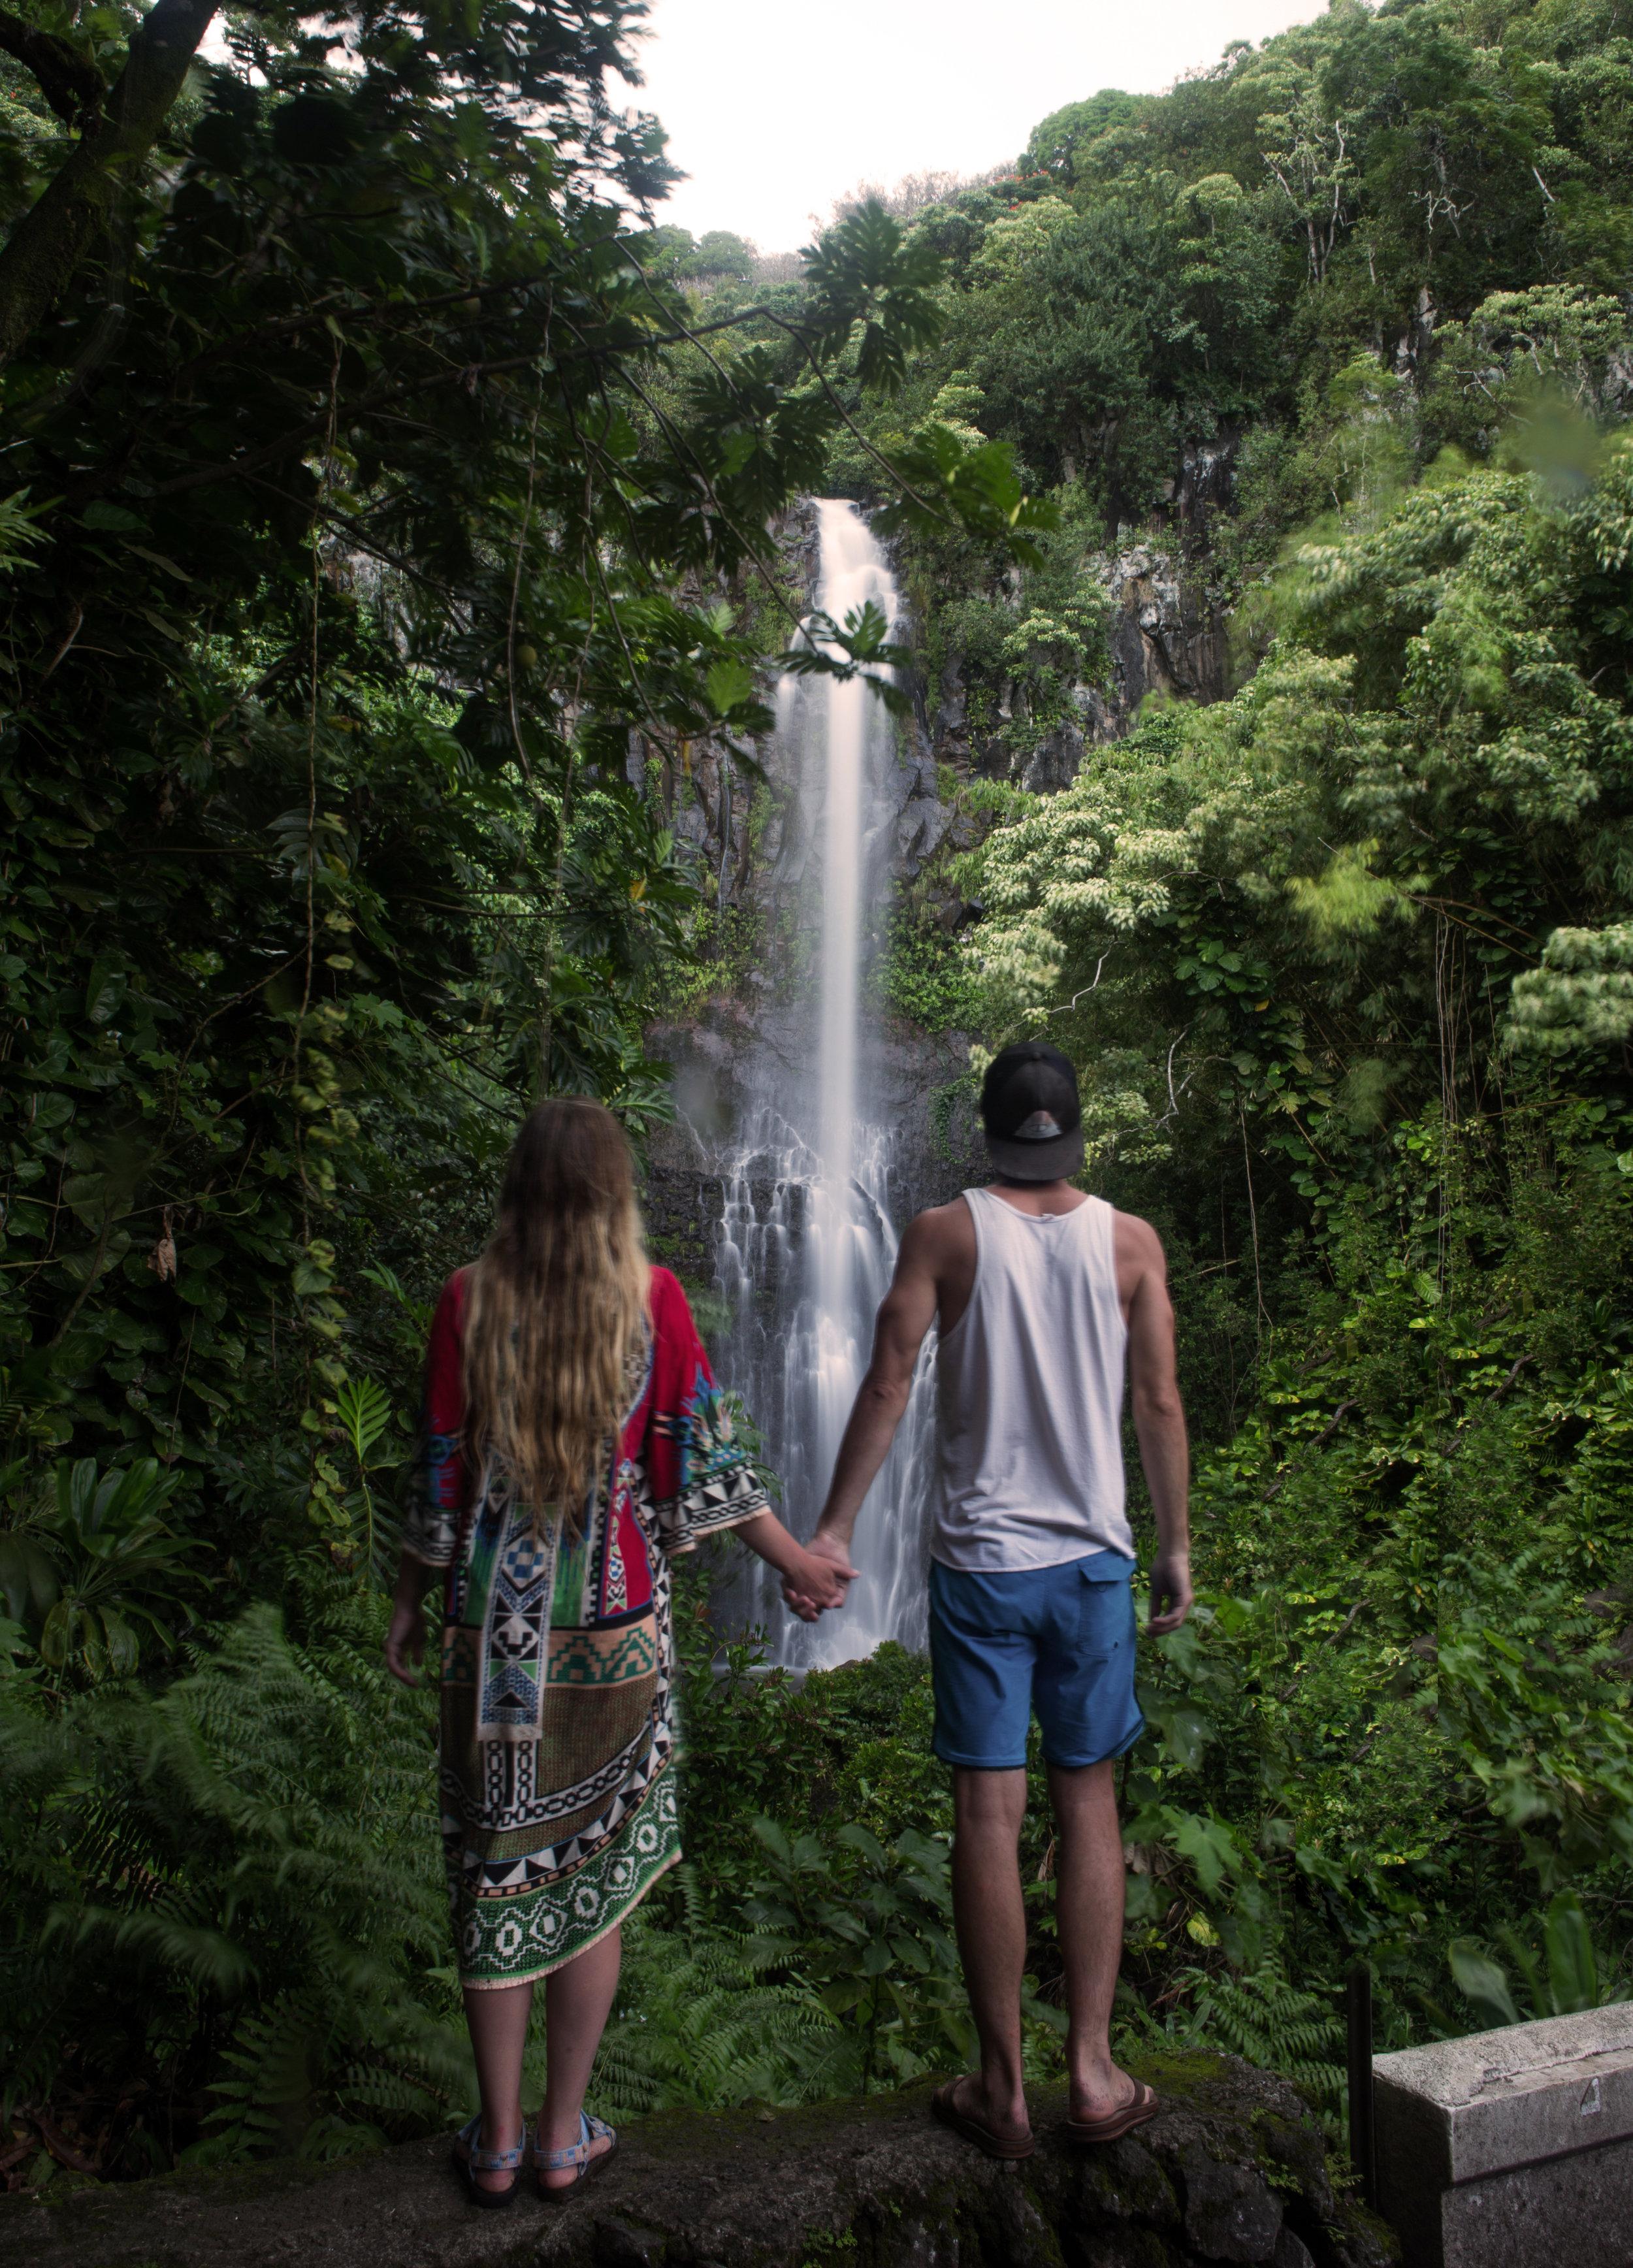 AstroBandit_Maui_Hawaii_JordanRose_Hana_Waterfall_21.jpg